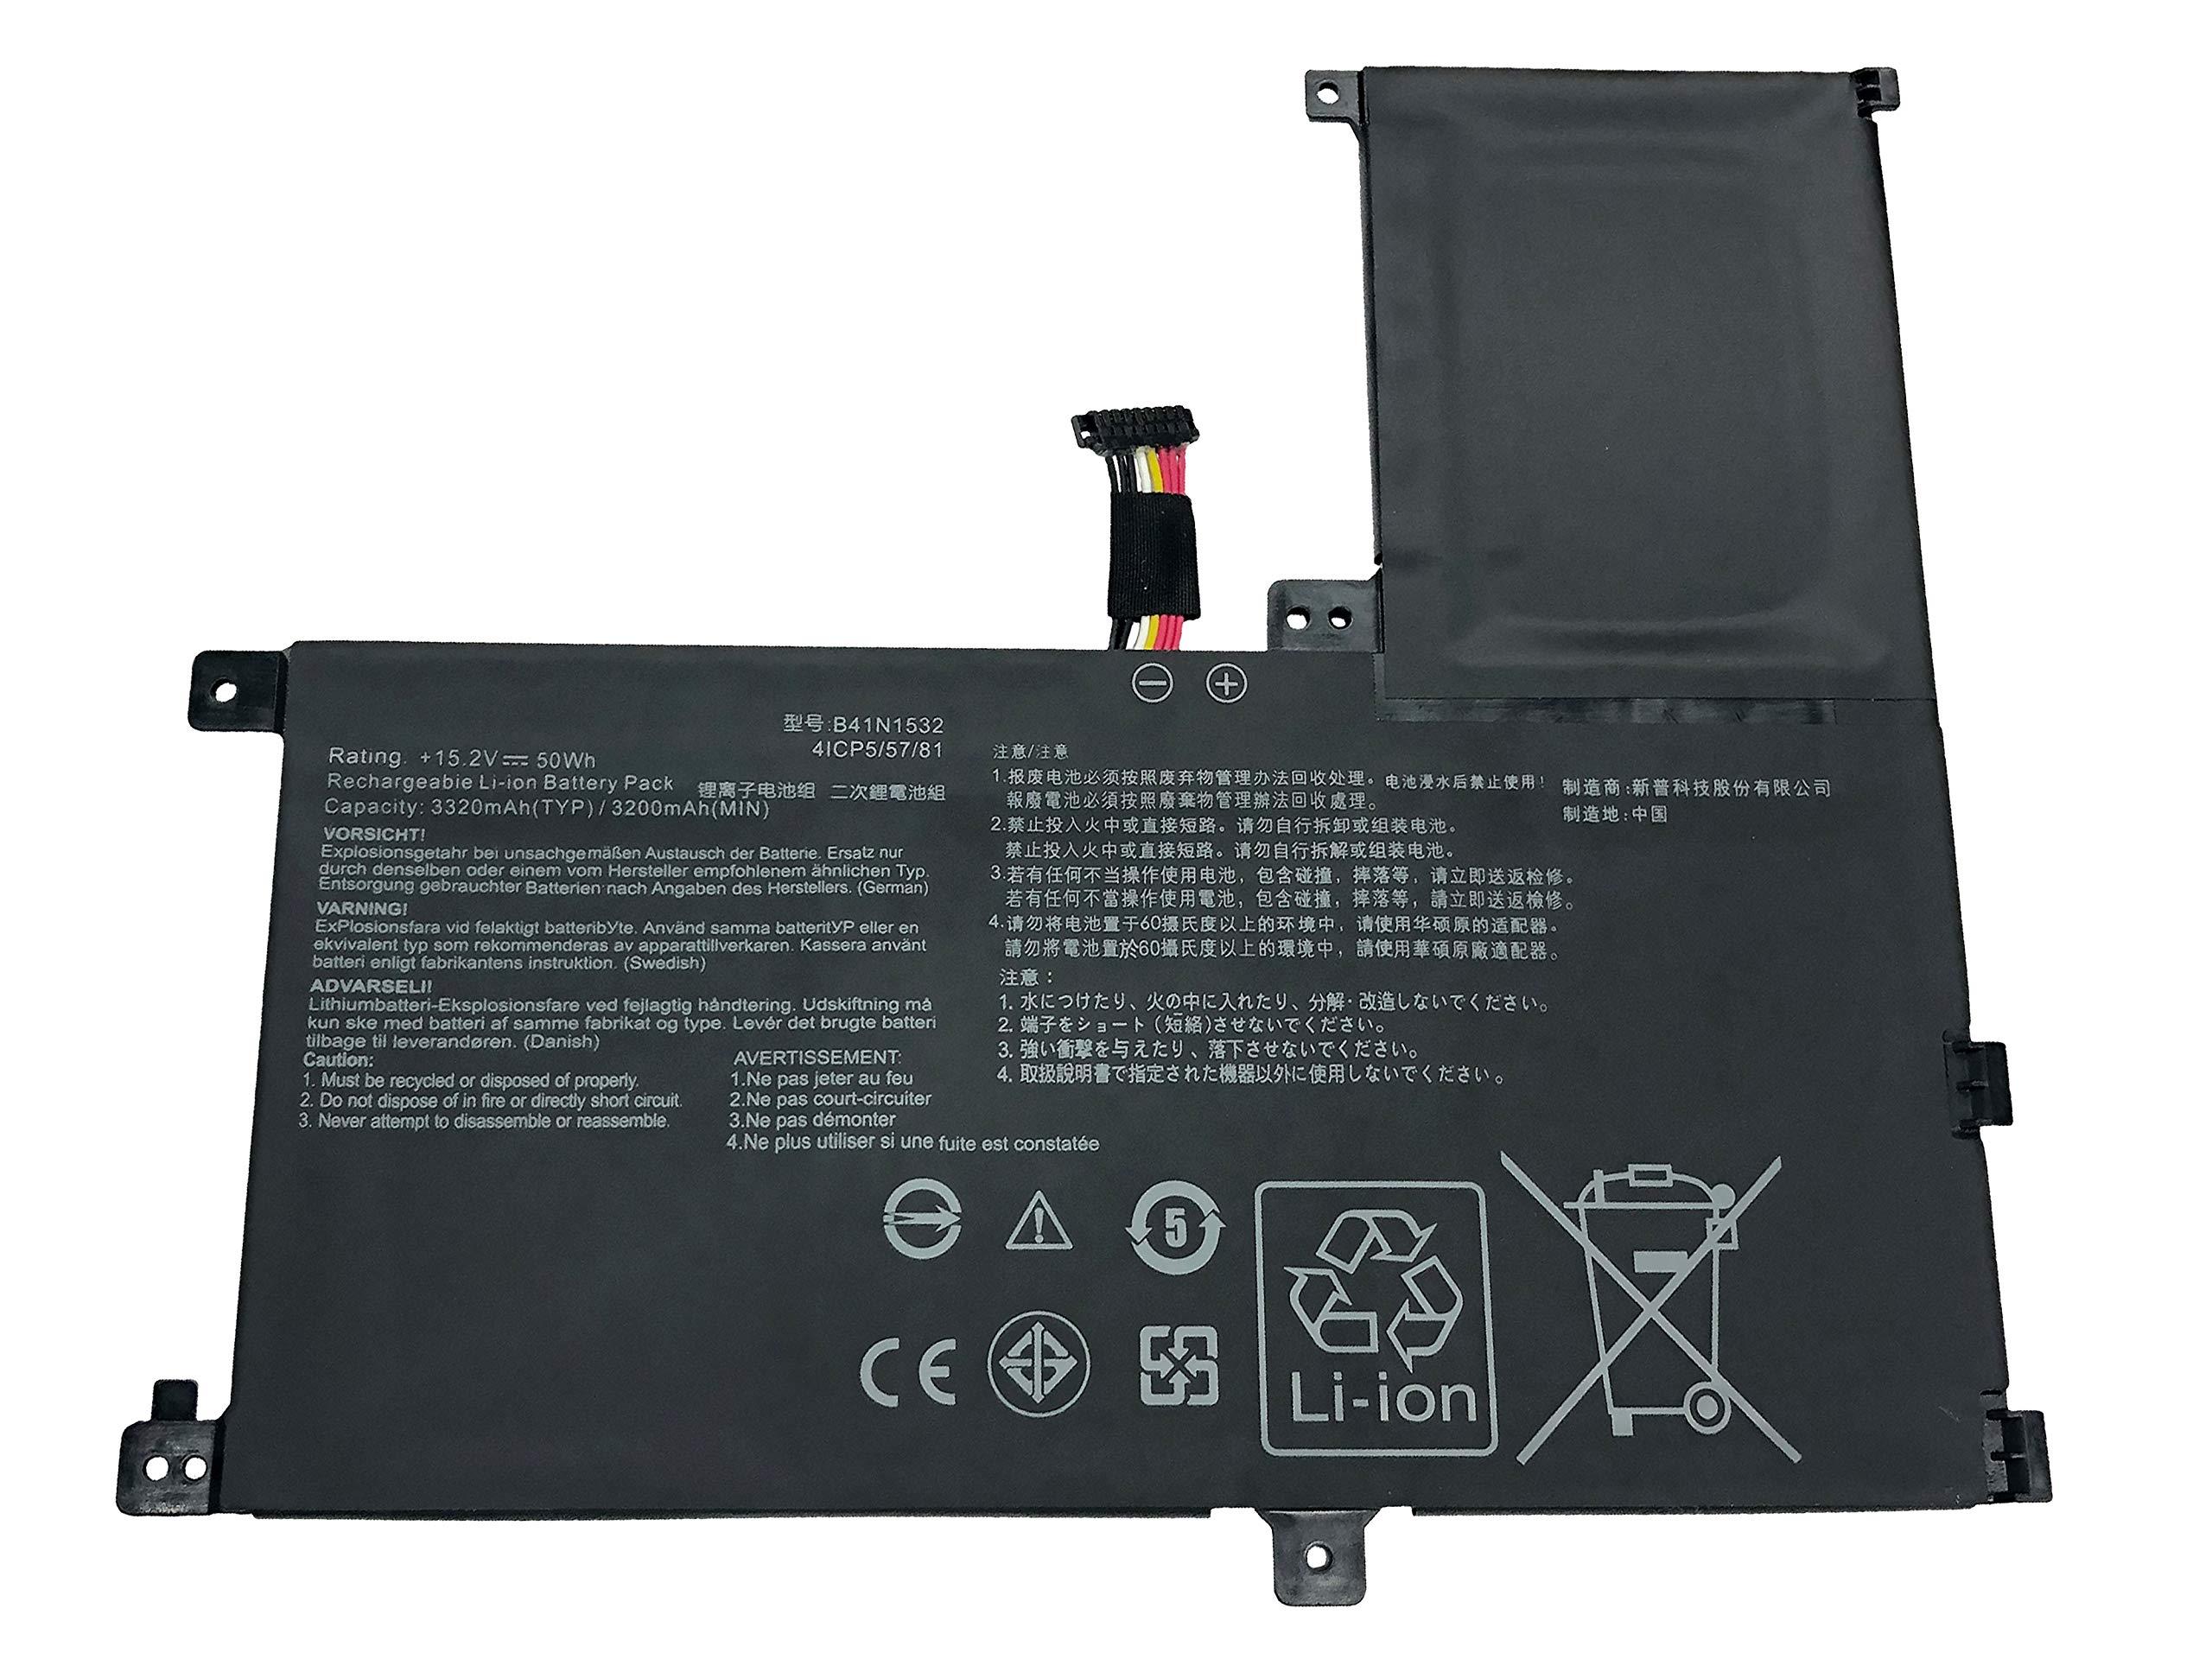 Bateria B41n1532 15.2v 50wh Asus Q504ua 15.6 Series 0b200-02